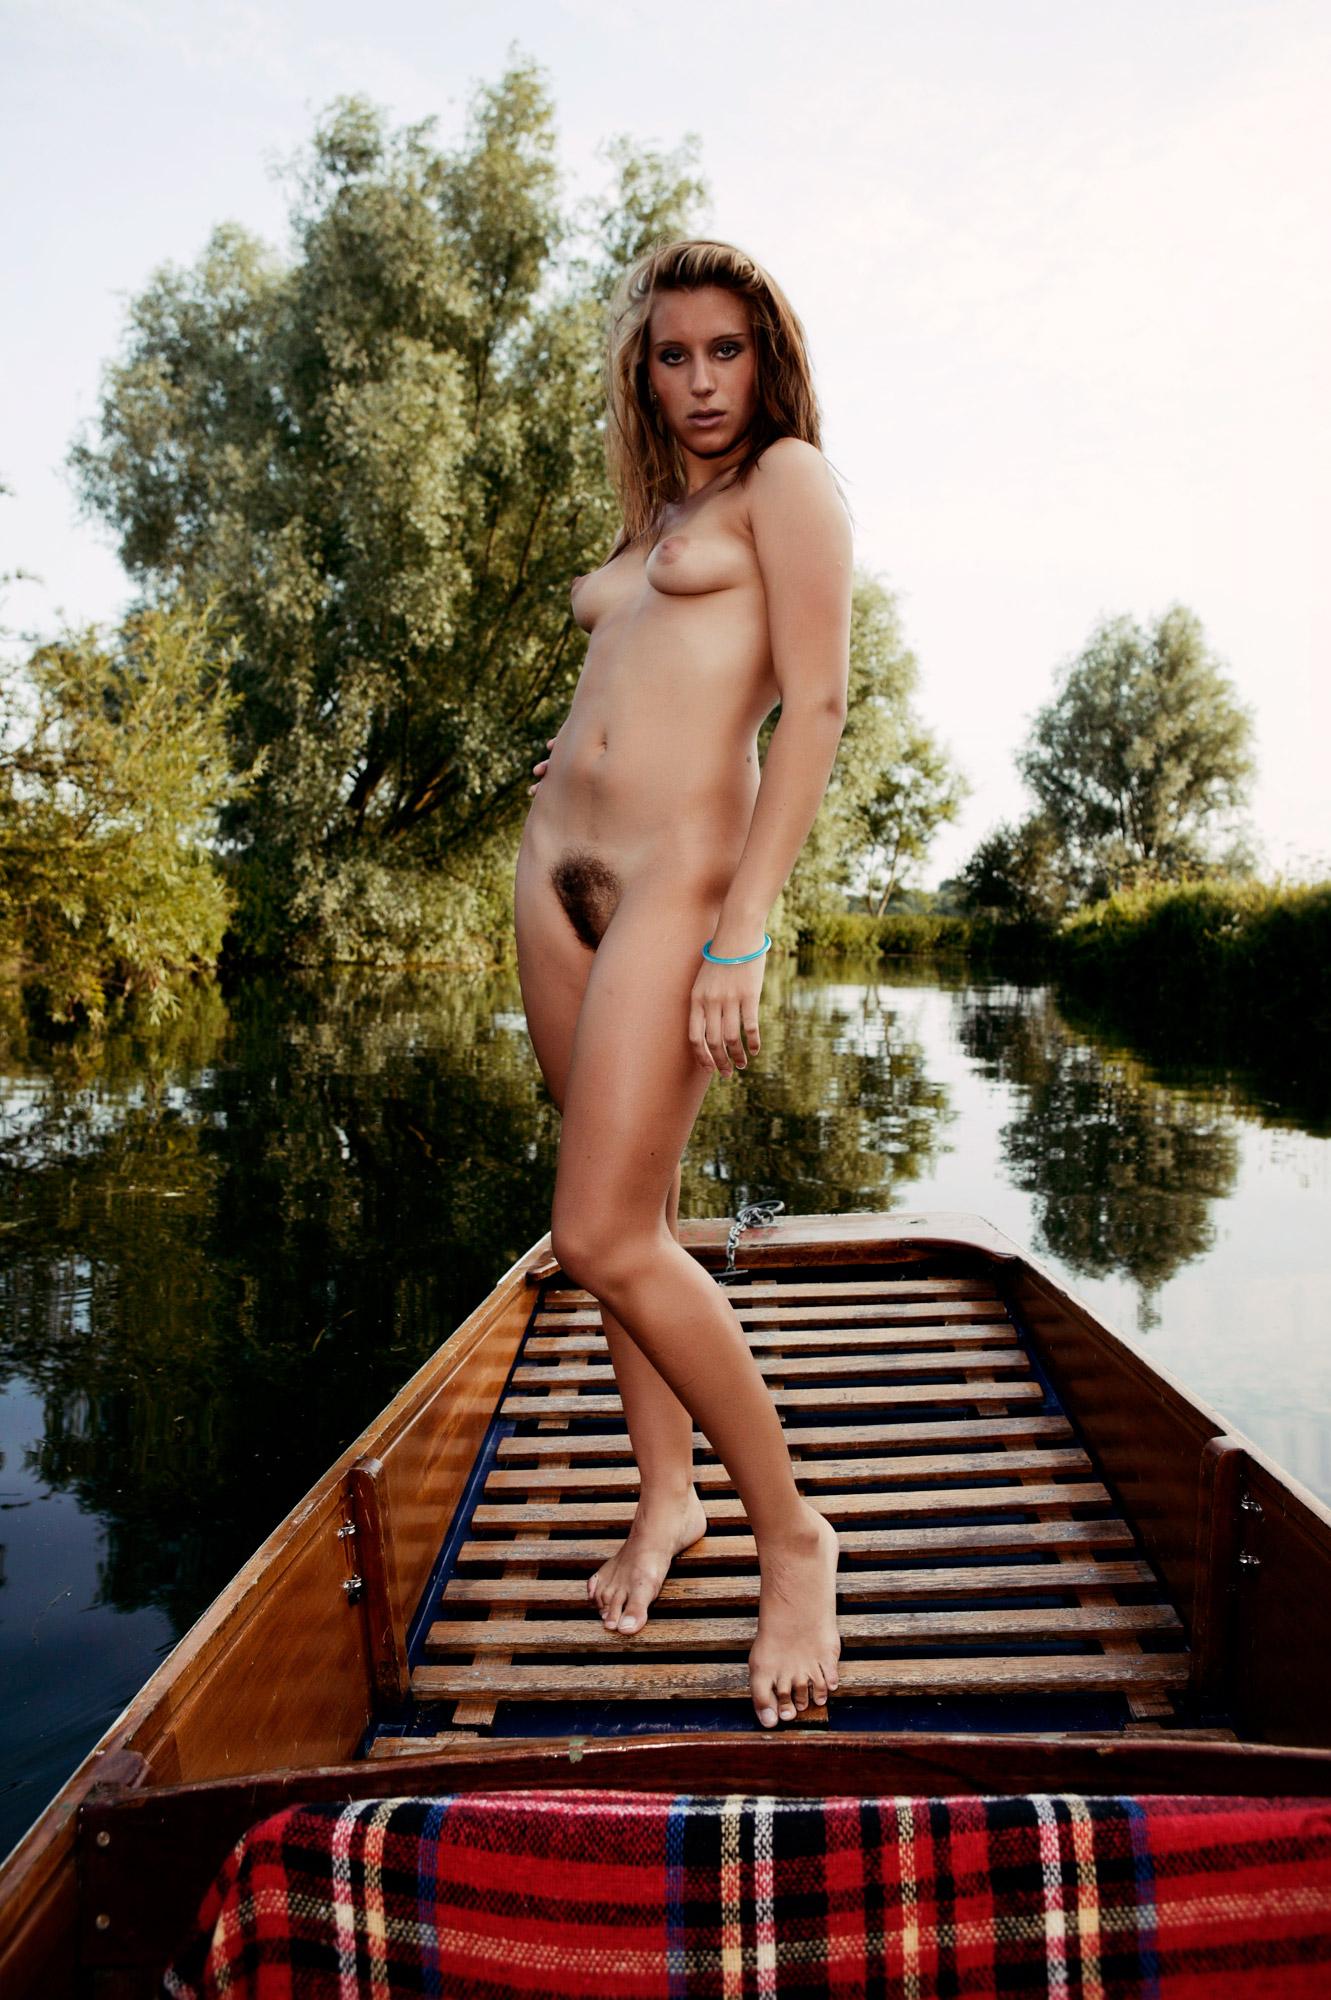 Naked on a punt